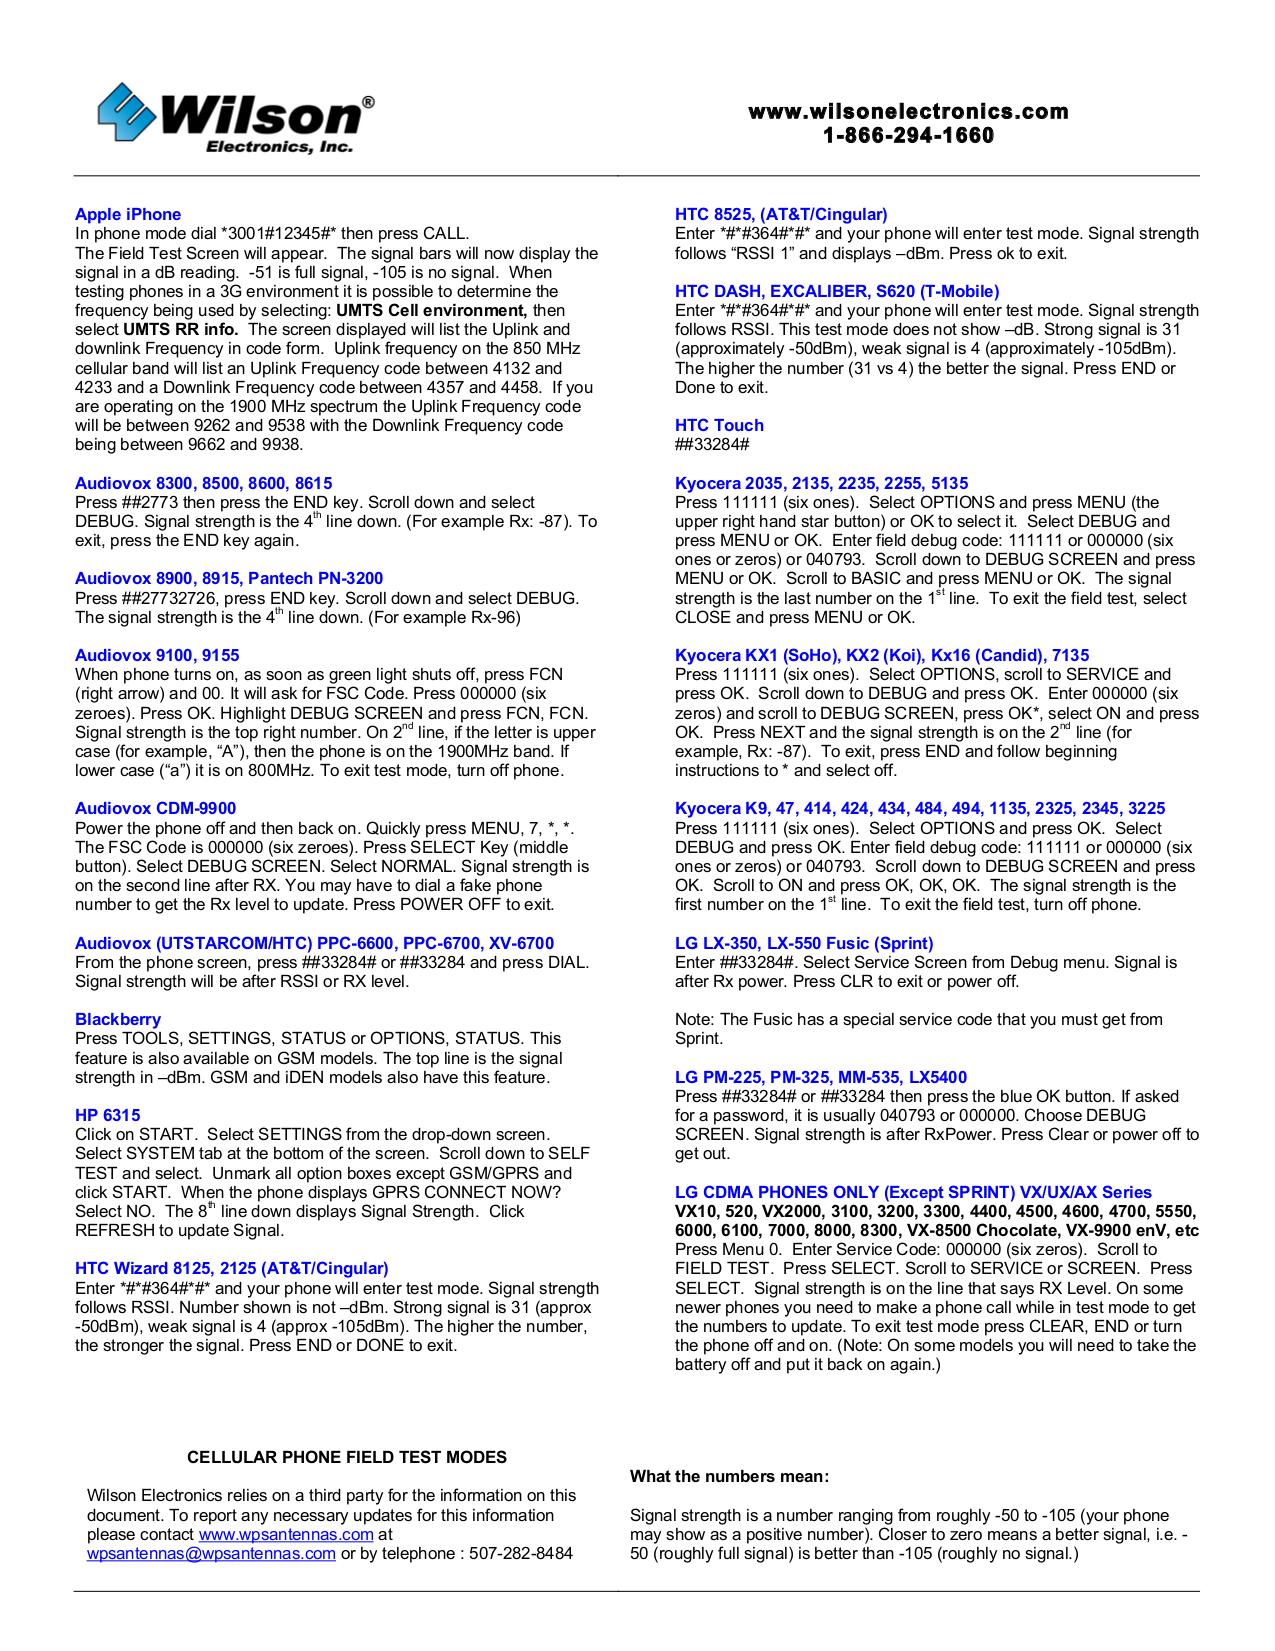 download free pdf for samsung mm a920 cell phone manual rh umlib com Samsung TV Owner Manuals Samsung S125G Manual